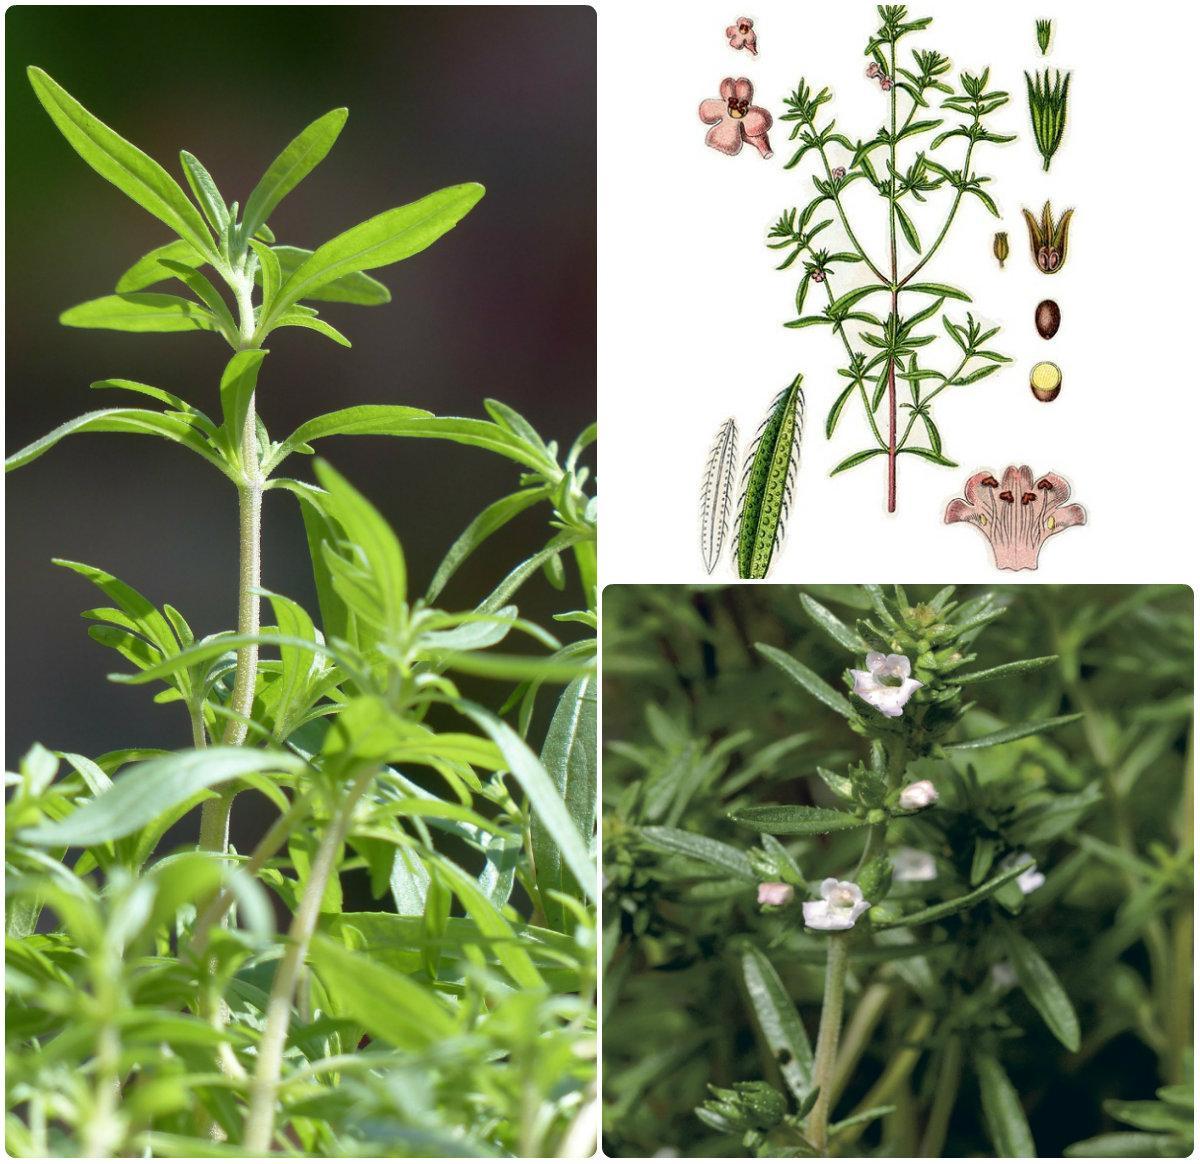 ЧАБЕР / Satureja hortensis